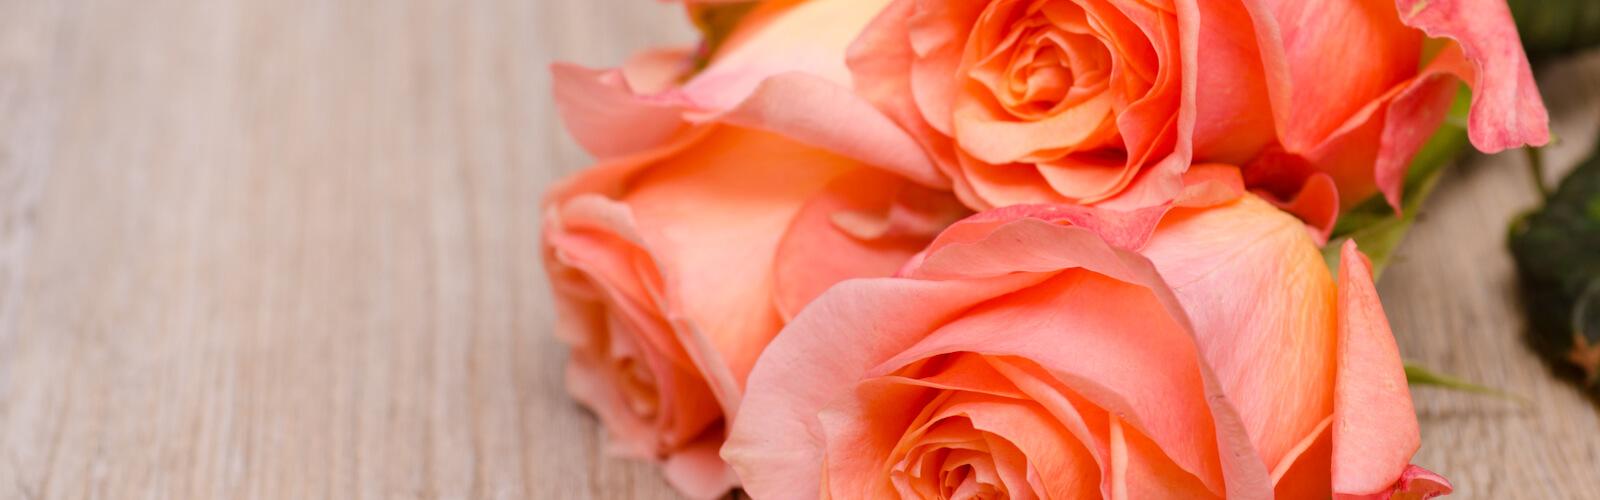 Three orange flowers of roses on wooden board